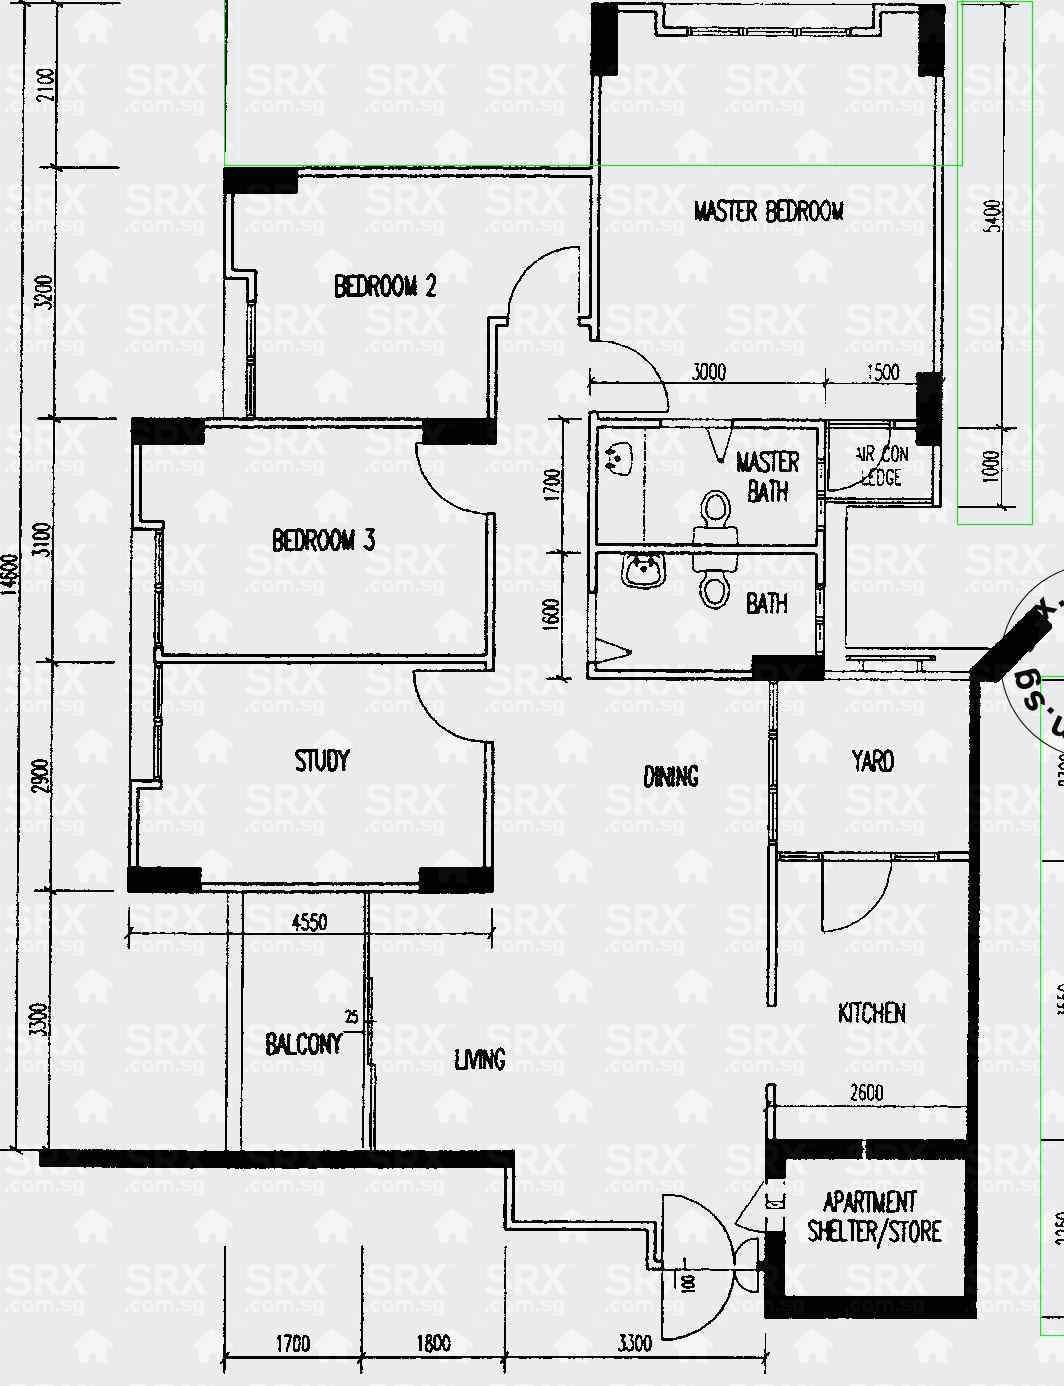 Jurong West Central 1 Hdb Details Srx Property